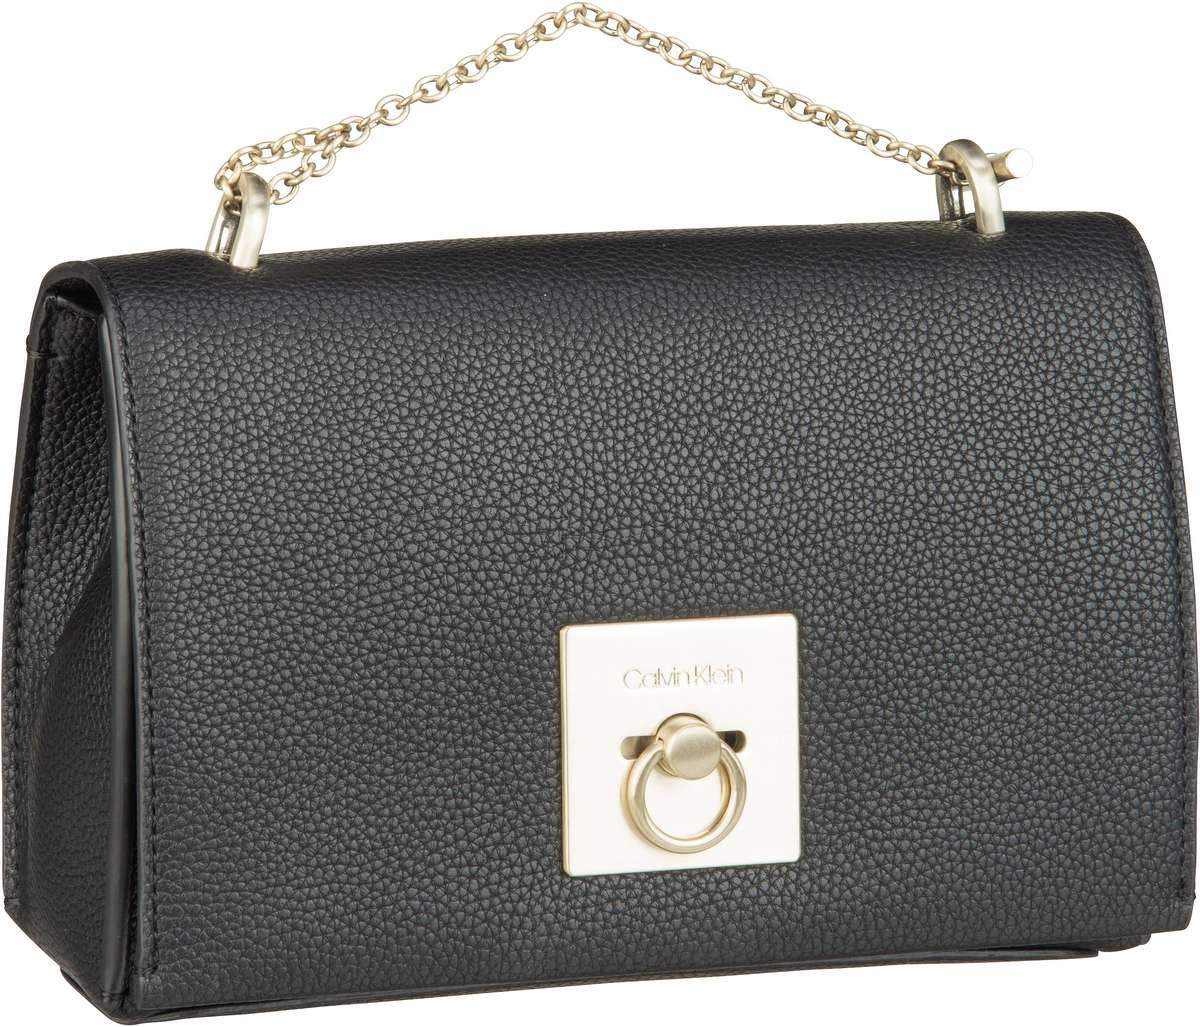 Handtasche CK Lock Medium Flap Crossbody Black